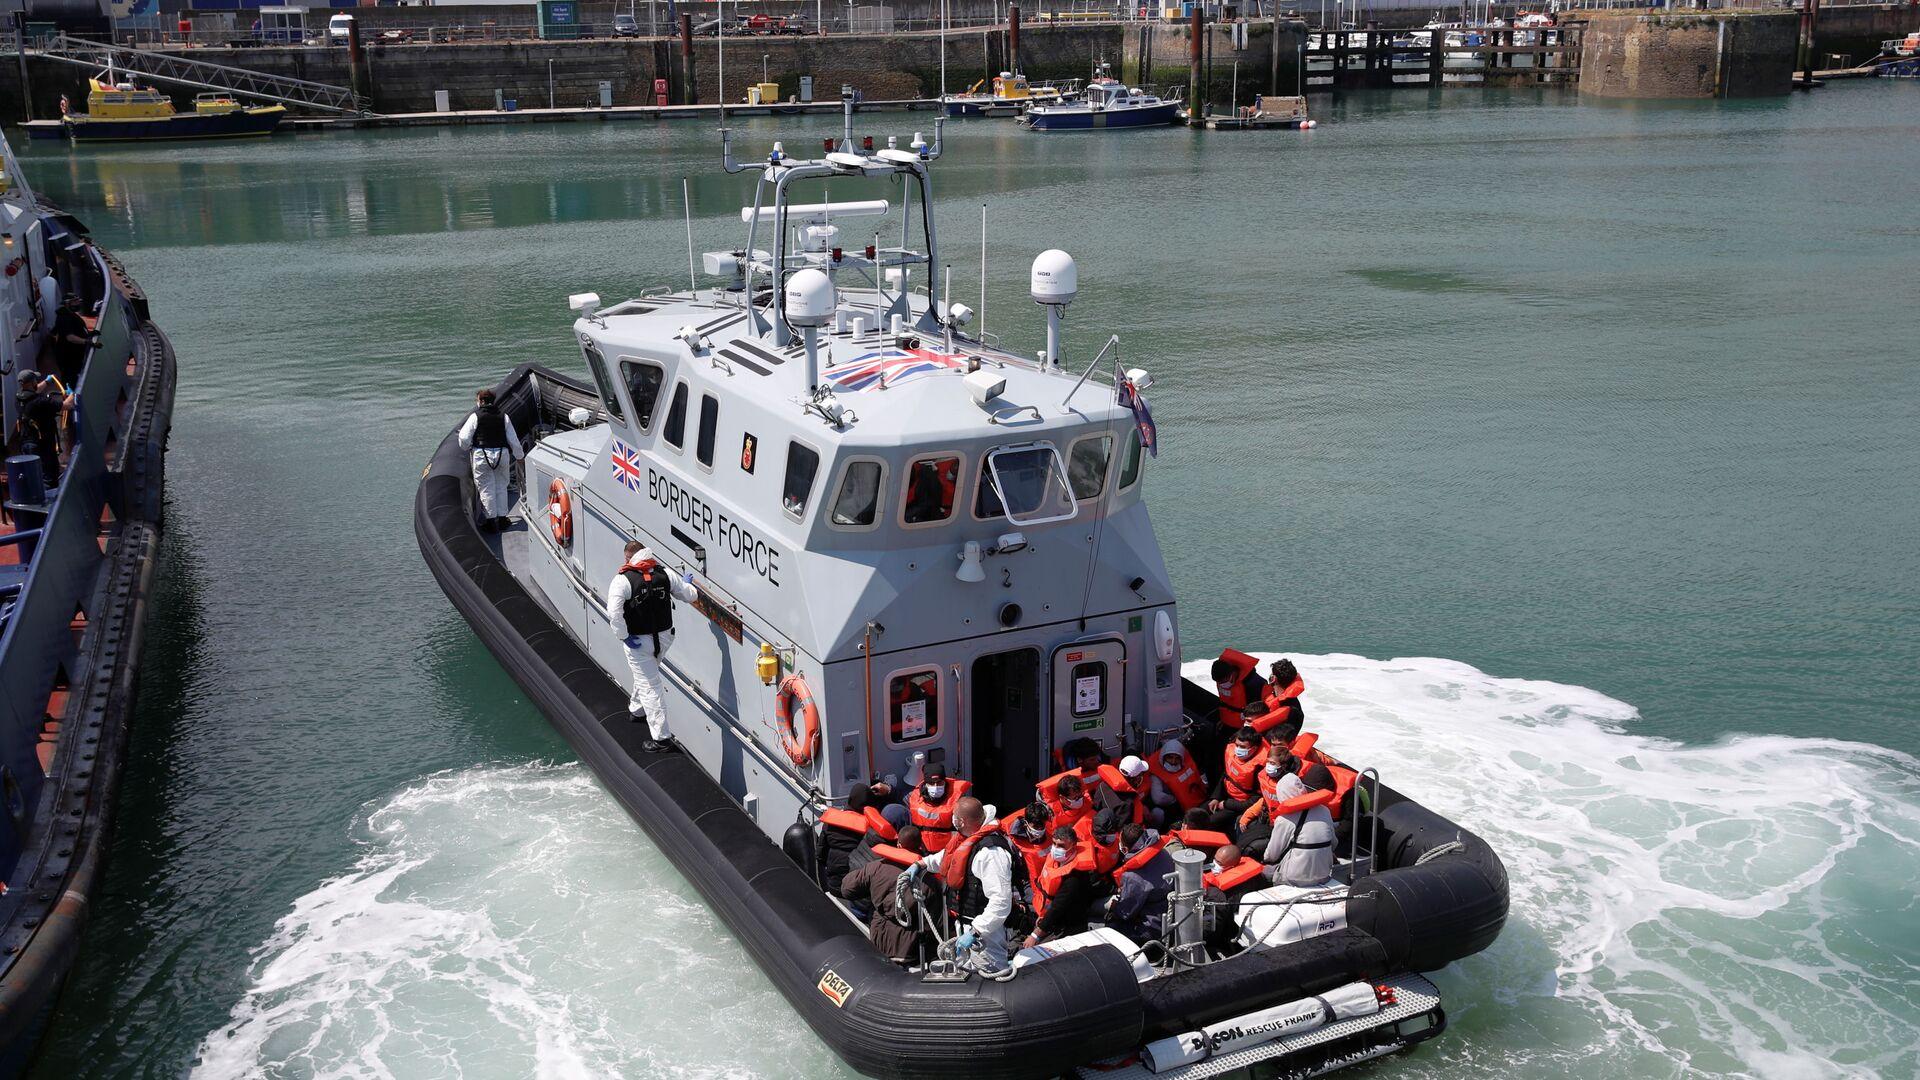 British Border Force staff bring migrants into Dover harbour, in Dover, Britain, June 6, 2021 - Sputnik International, 1920, 09.09.2021